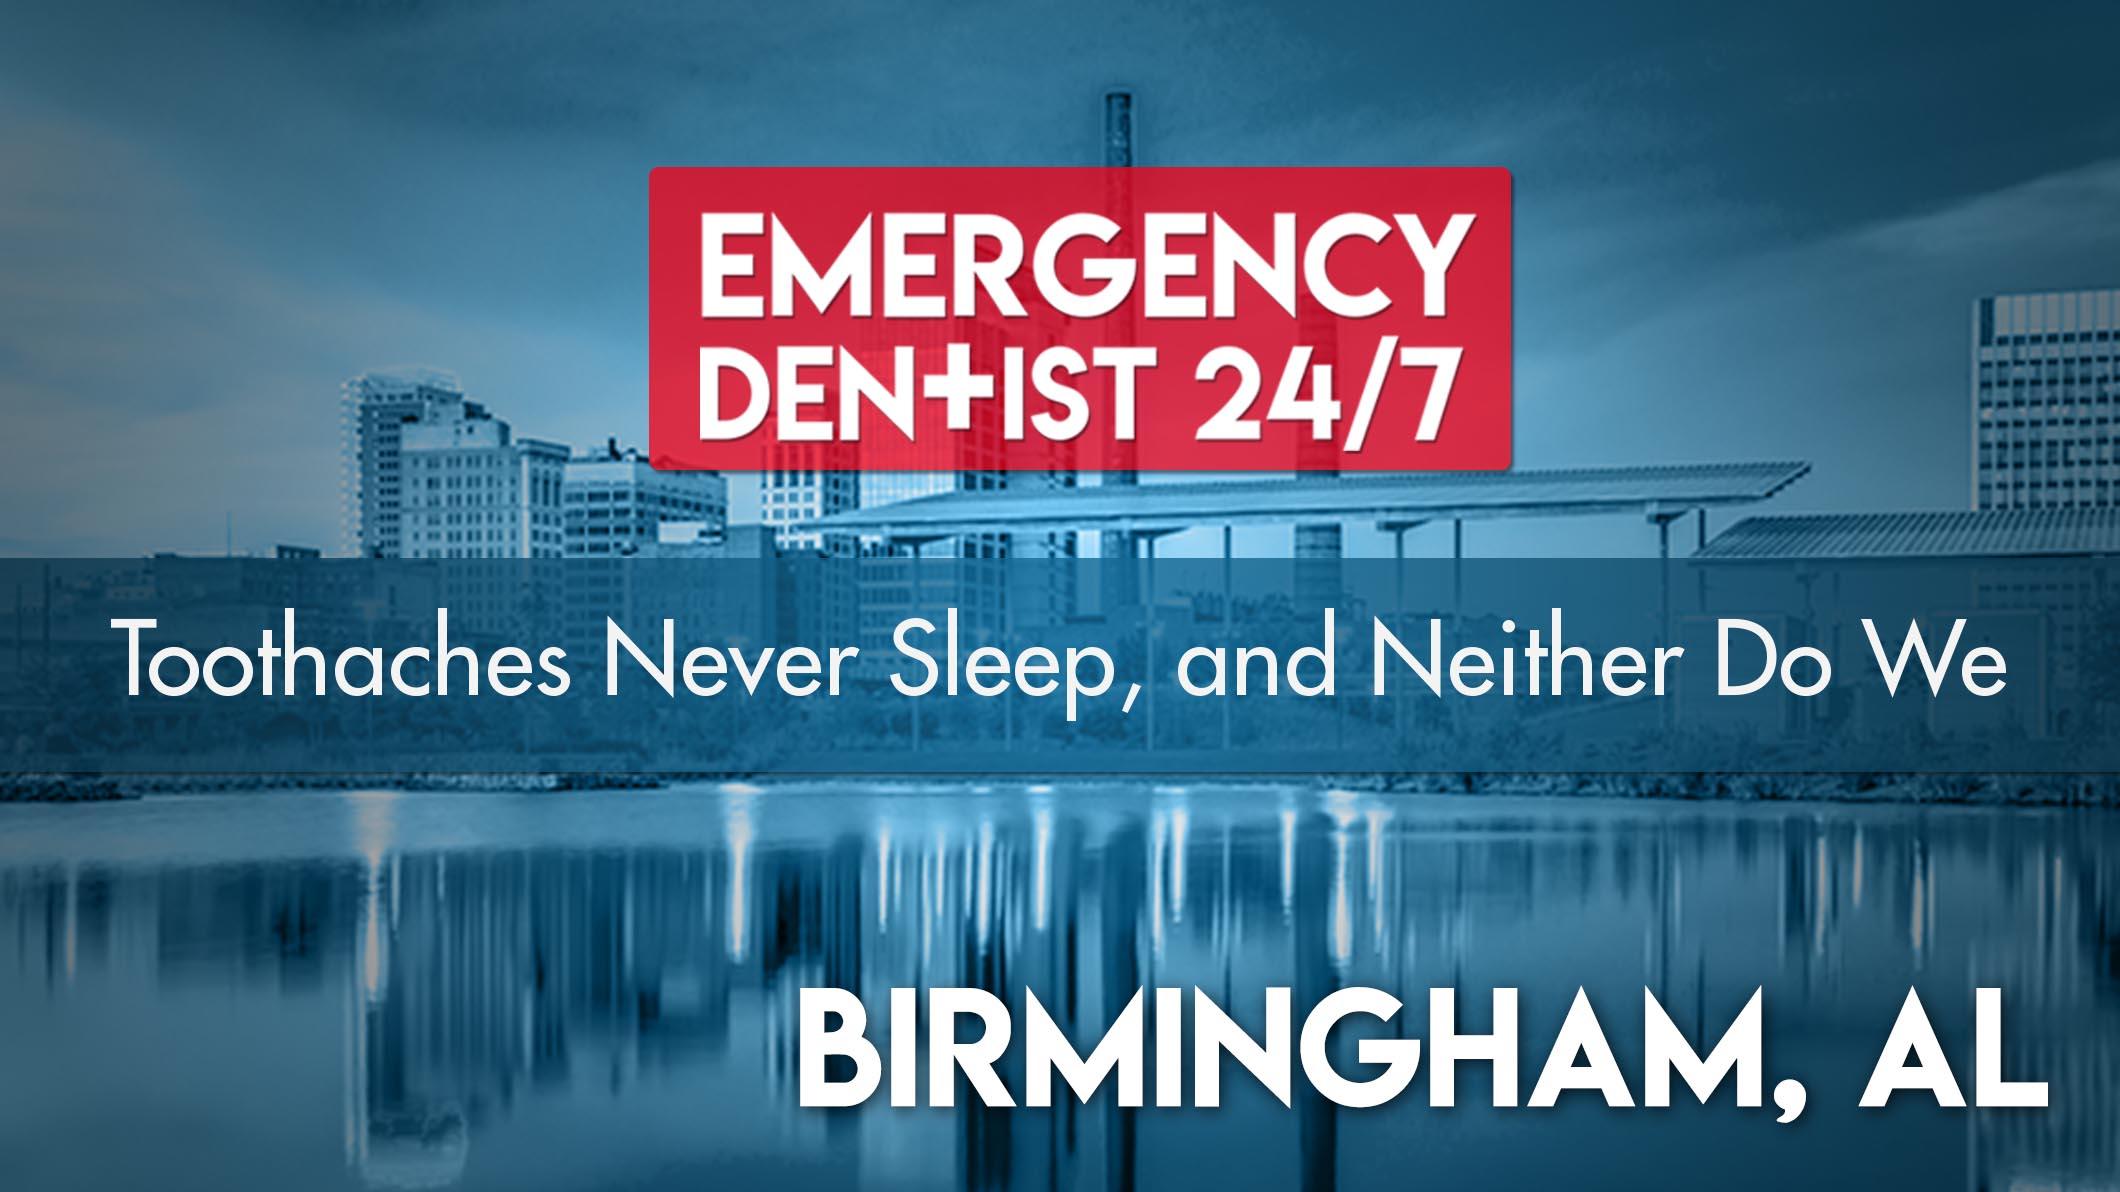 Emergency Dentist Birmingham 24/7 cover